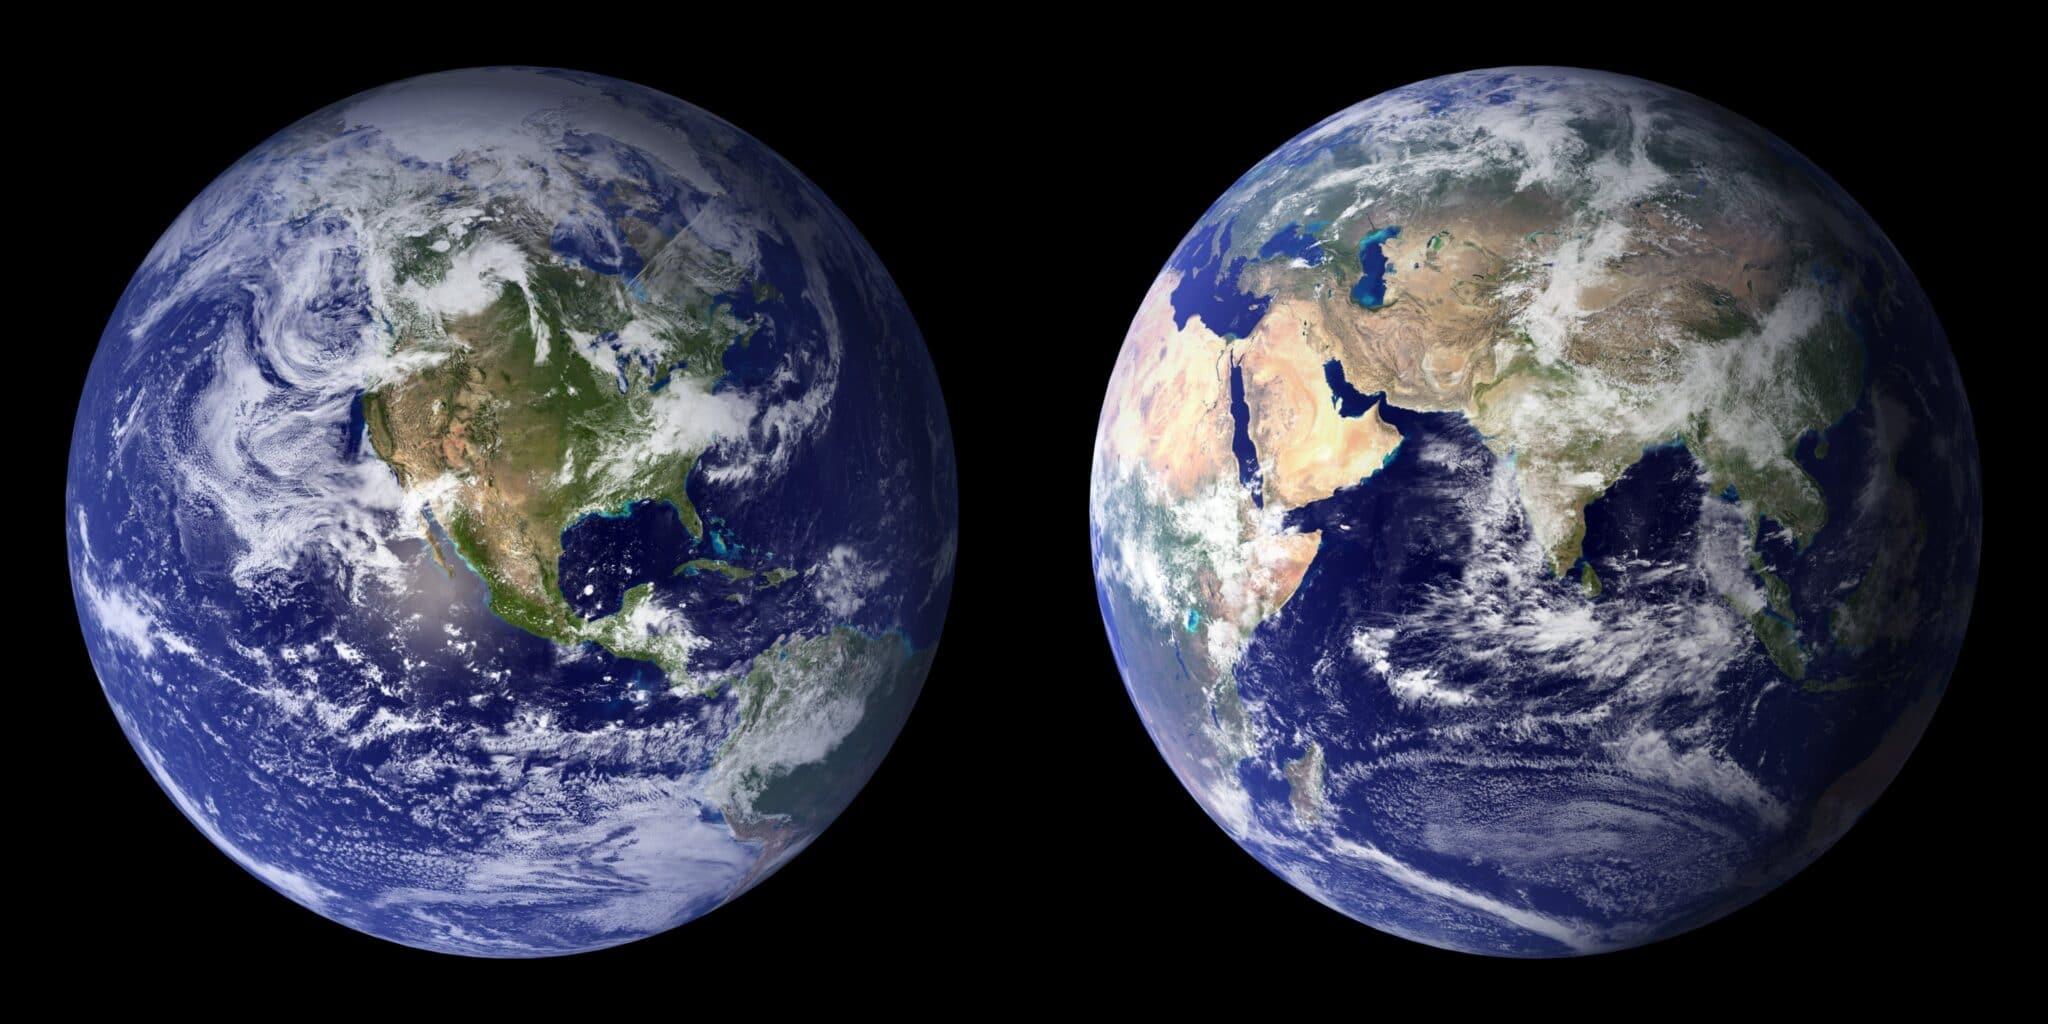 Vista della Terra.